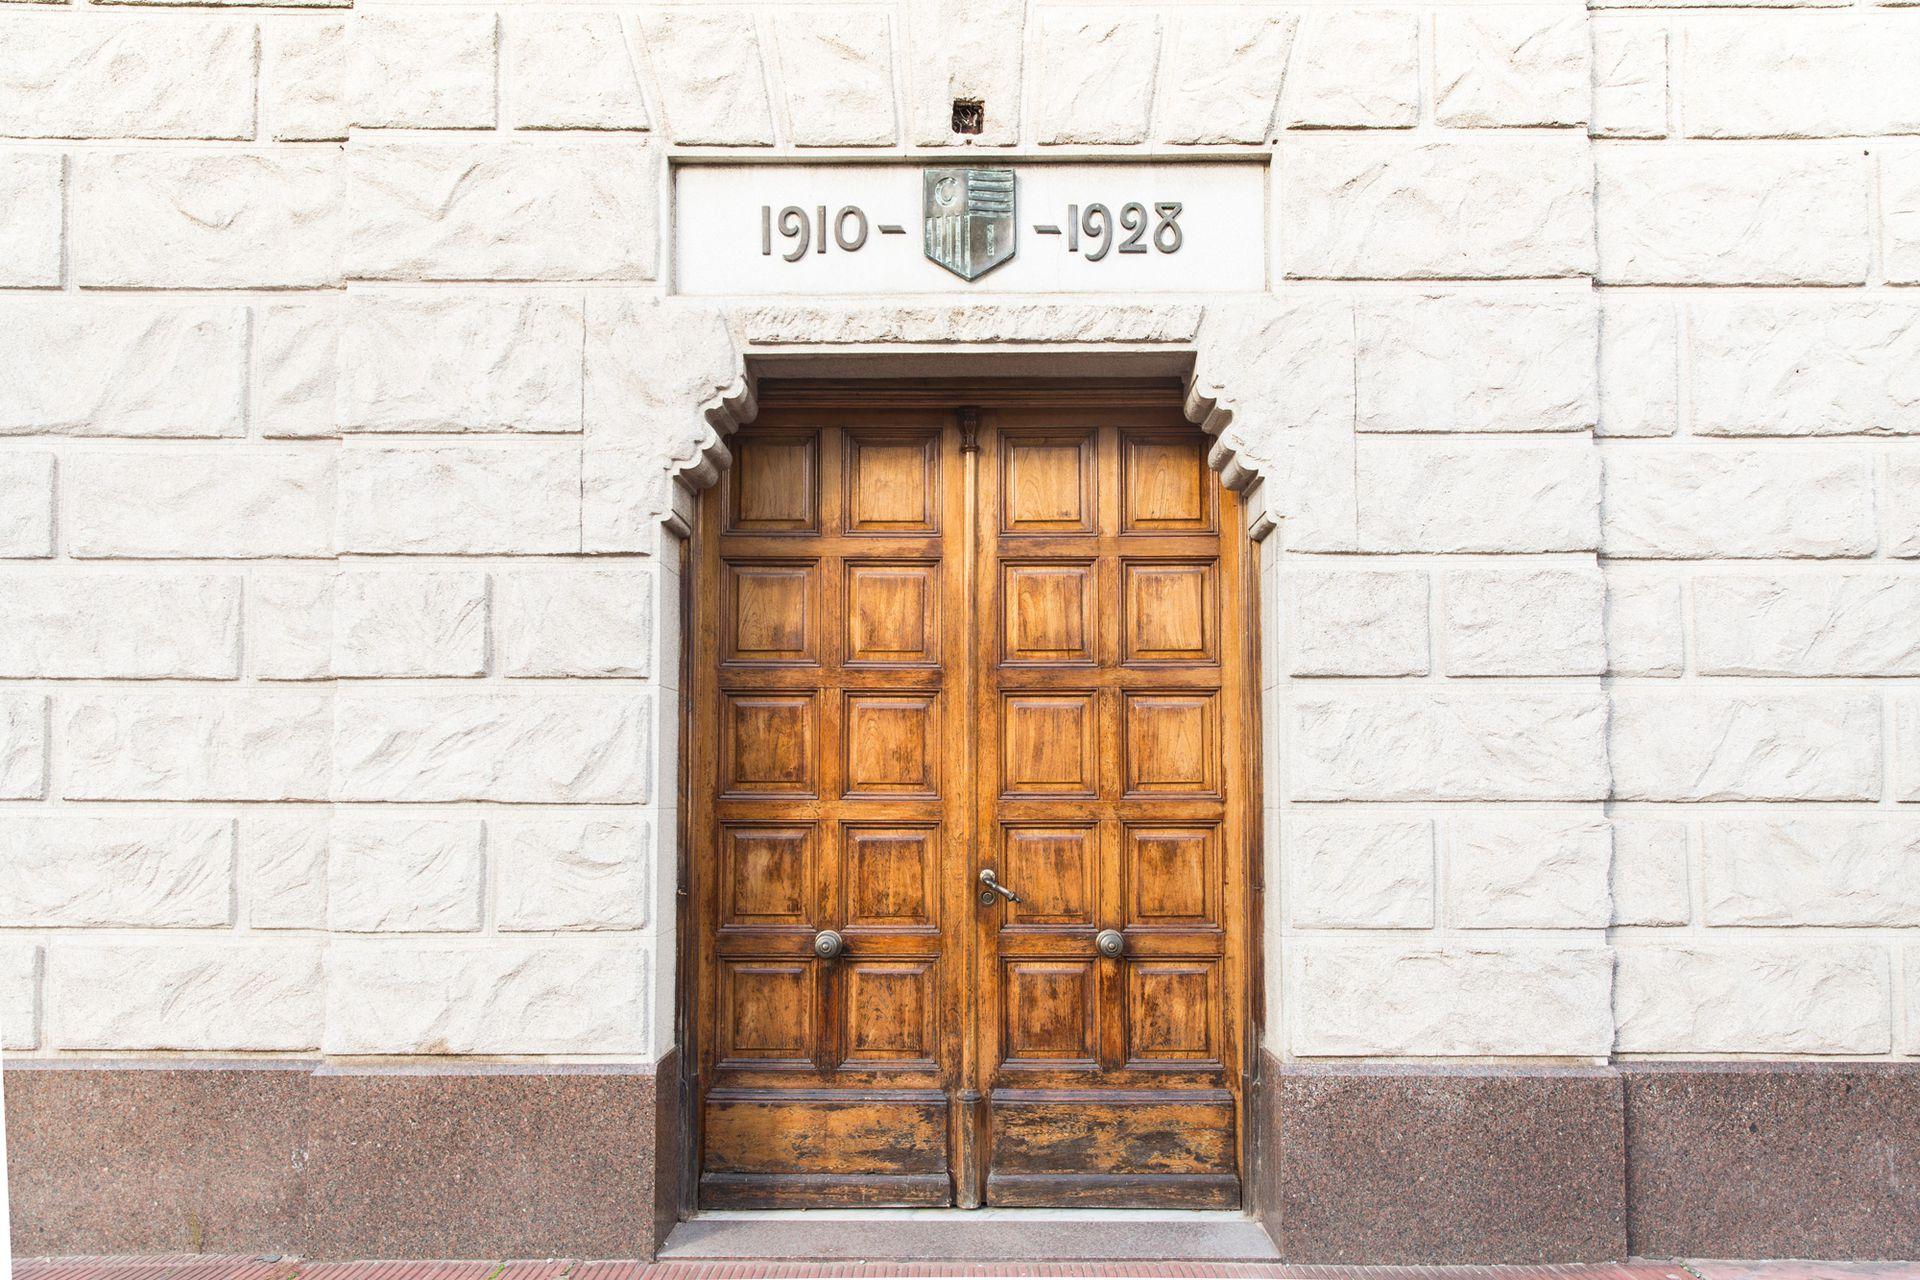 1910-1928: año de fundación e inauguración de la sede actual, respectivamente.